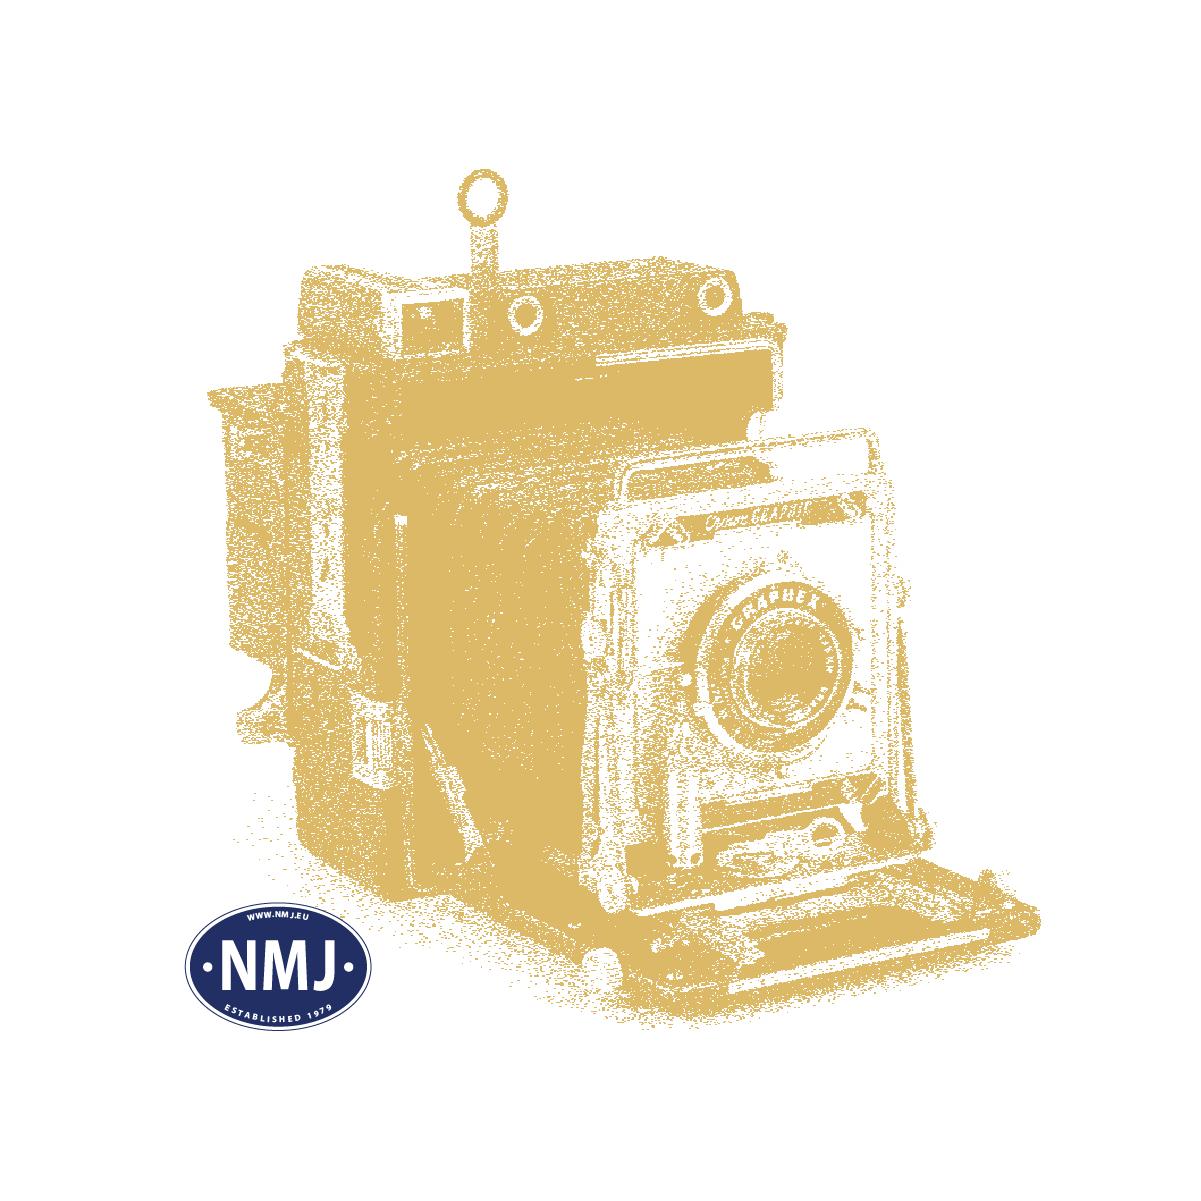 NMJT90017 - NMJ Topline NSB Di3a.605 Nydesign OL-logo 1994, DCC m/ Lyd